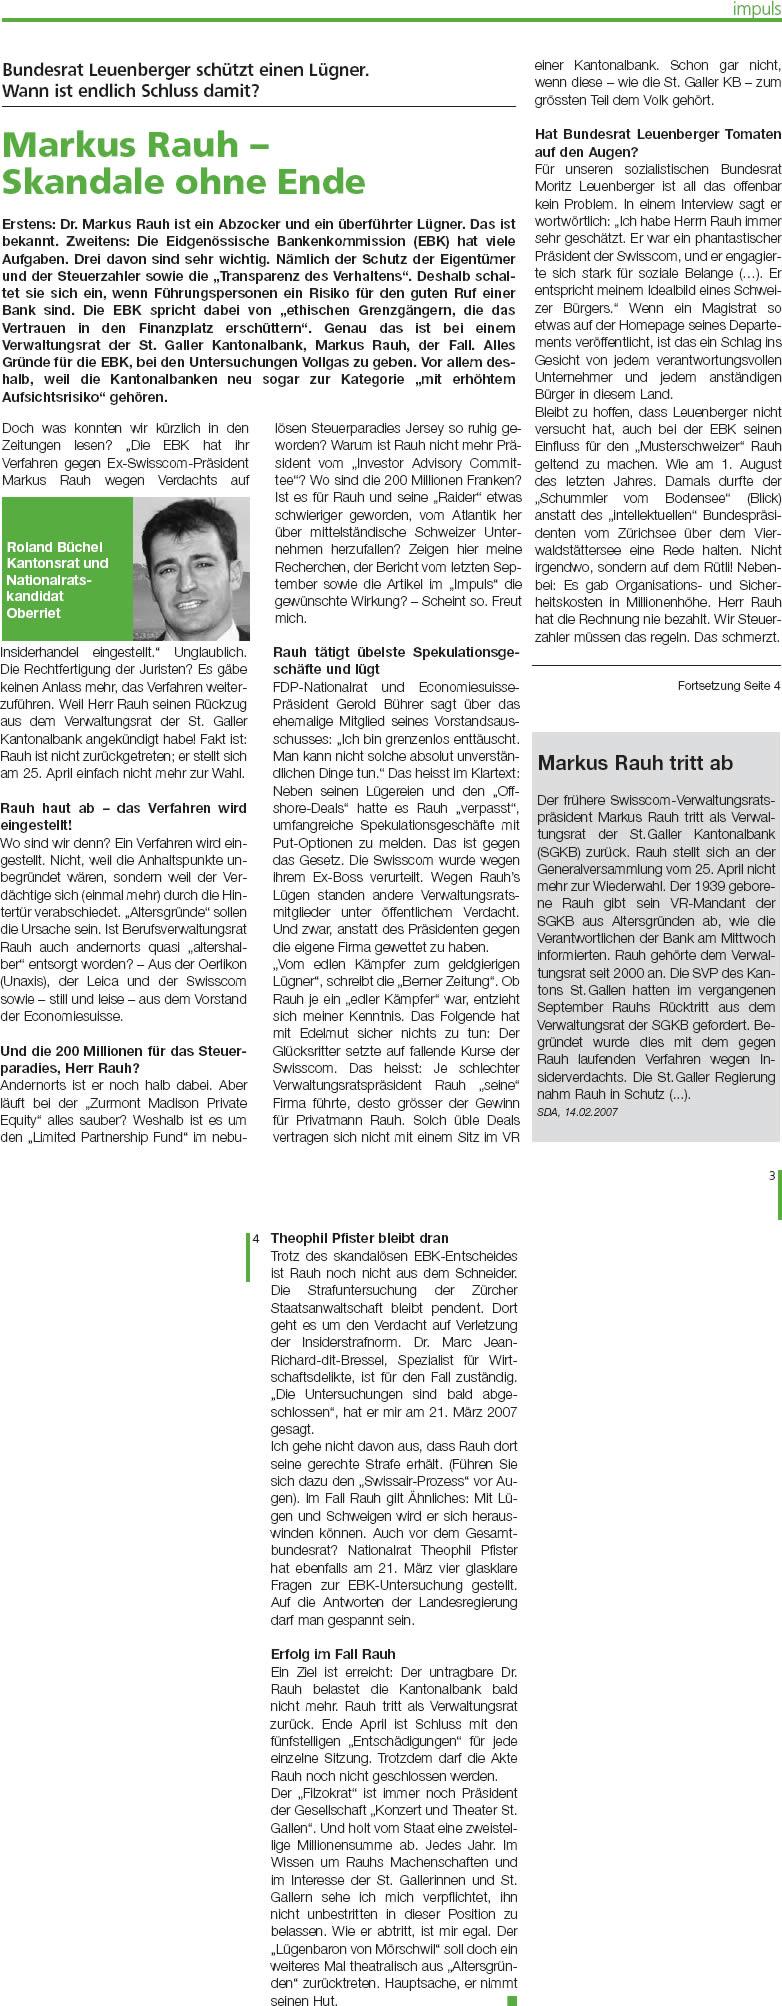 Markus Rauh - Skandale ohne Ende